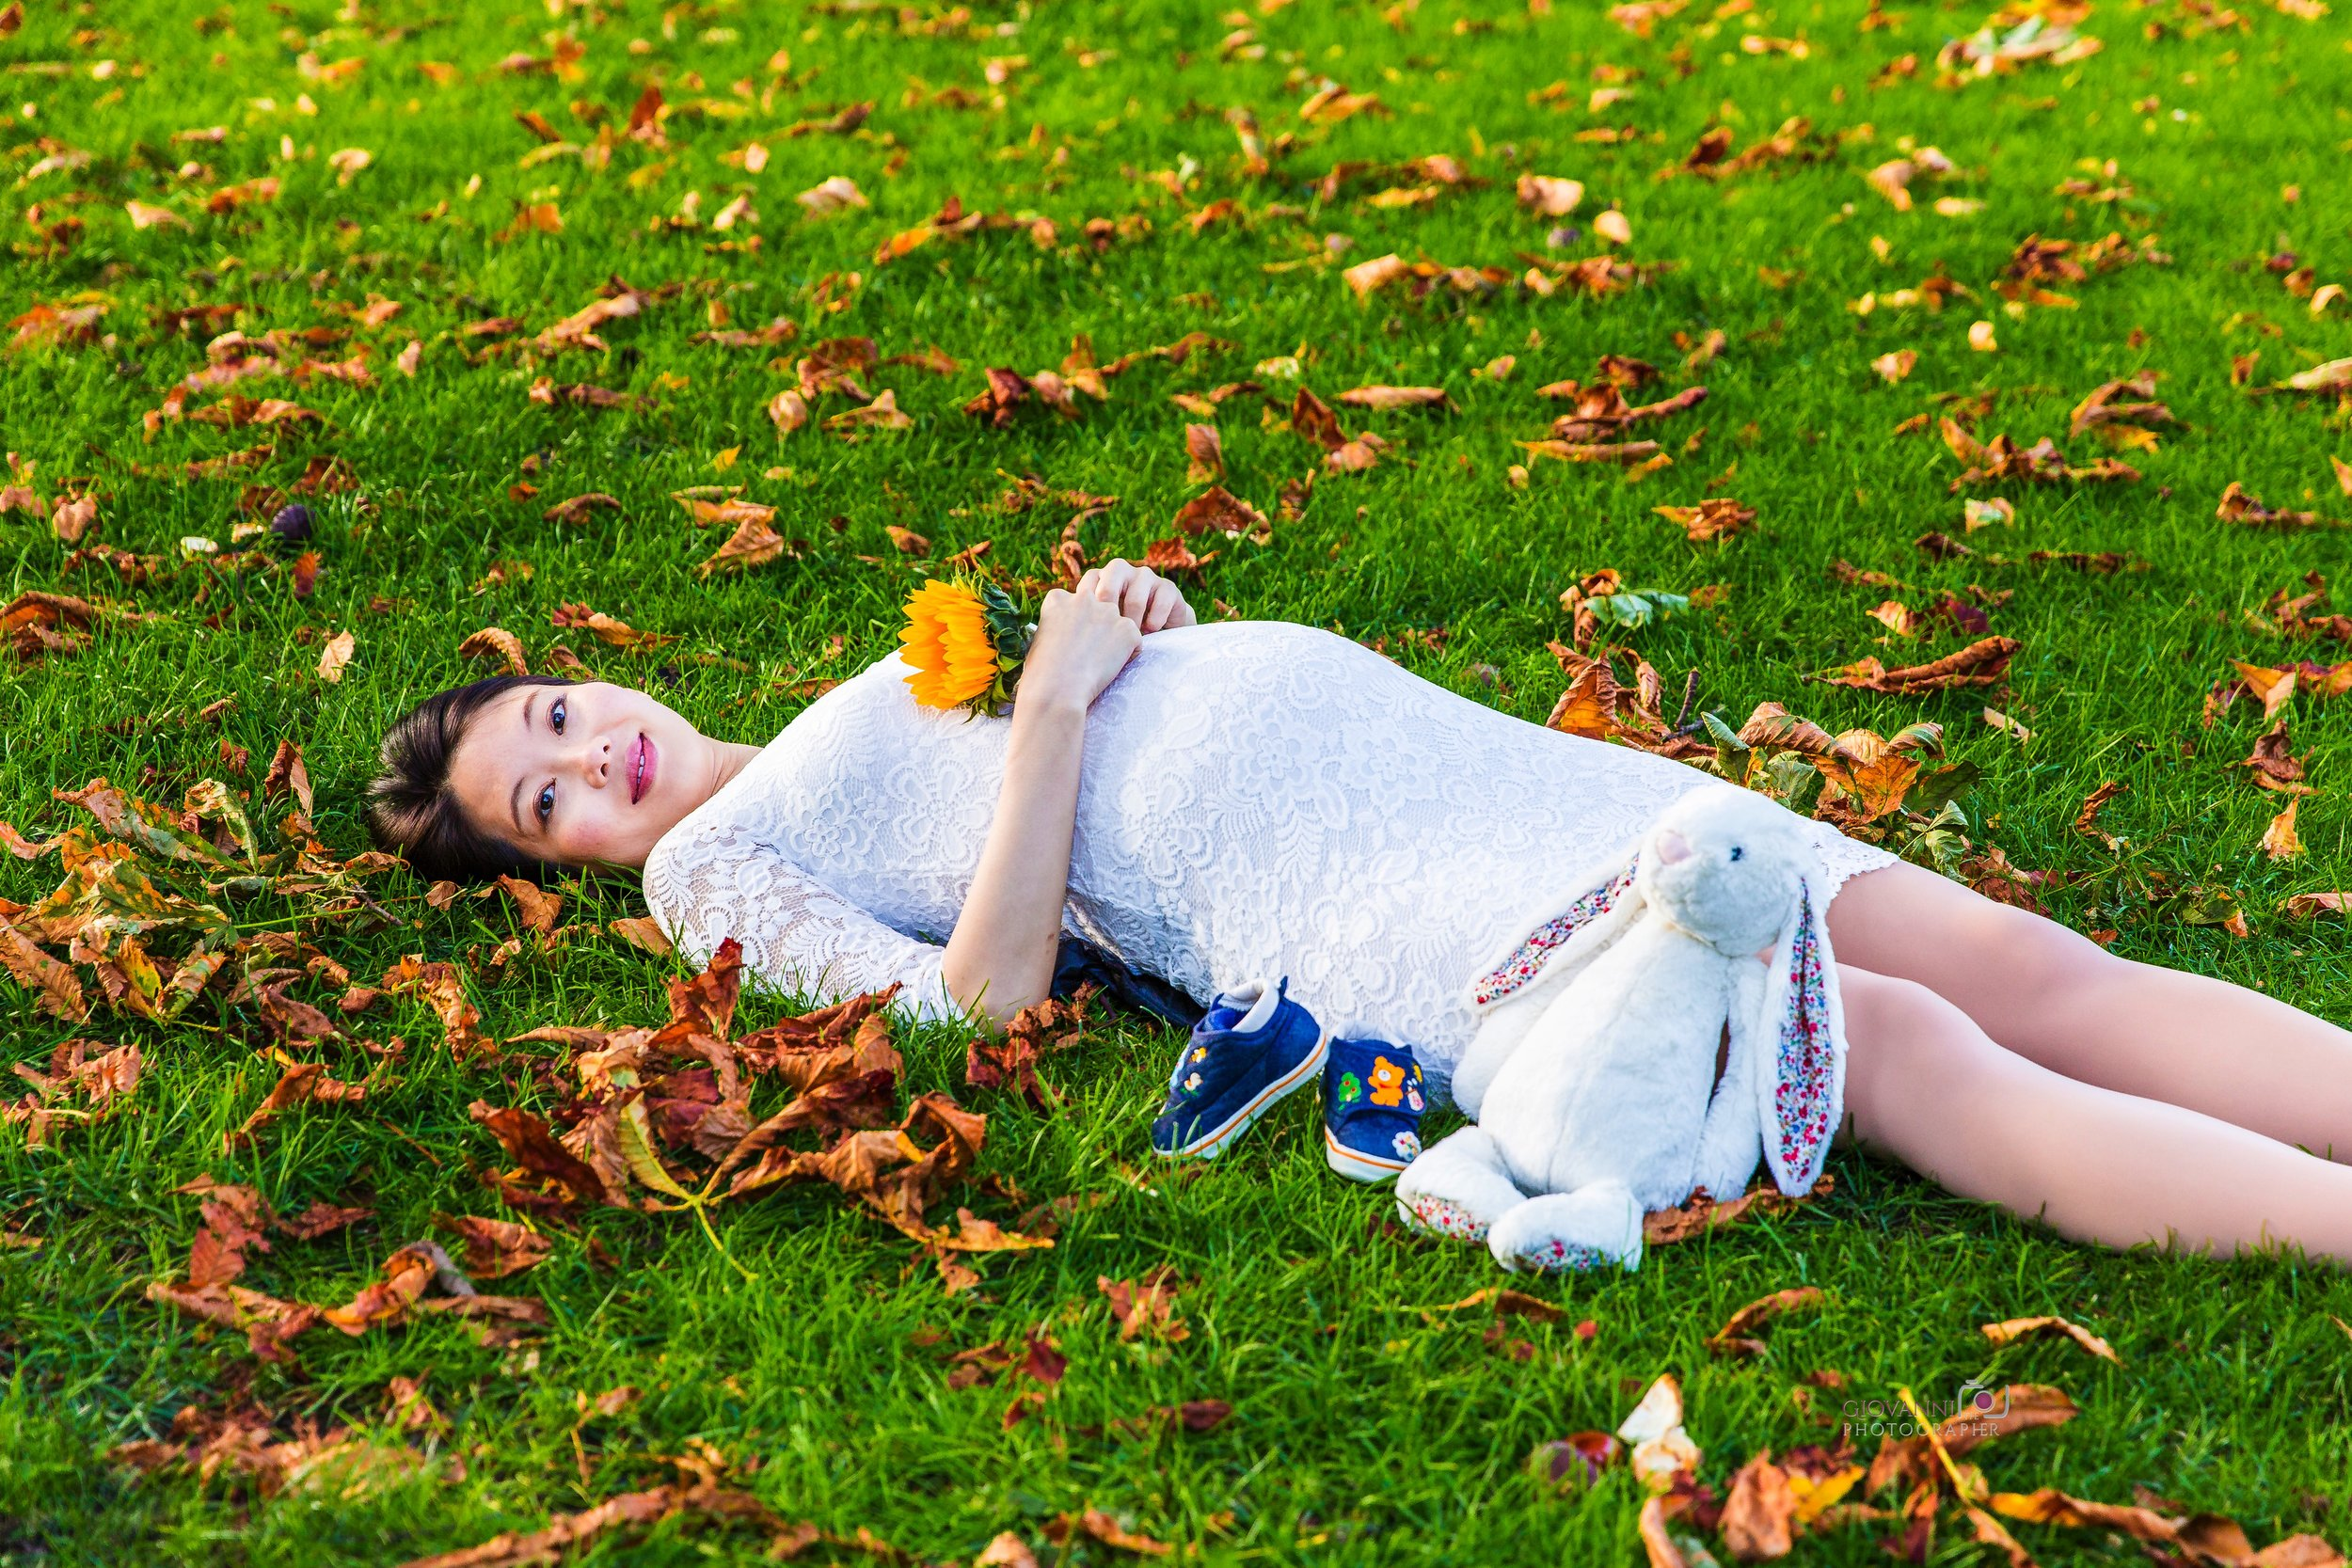 8C2A5955 Giovanni The Photographer Best Boston Maternity New Born Photography Public Garden - Common WM100.jpg